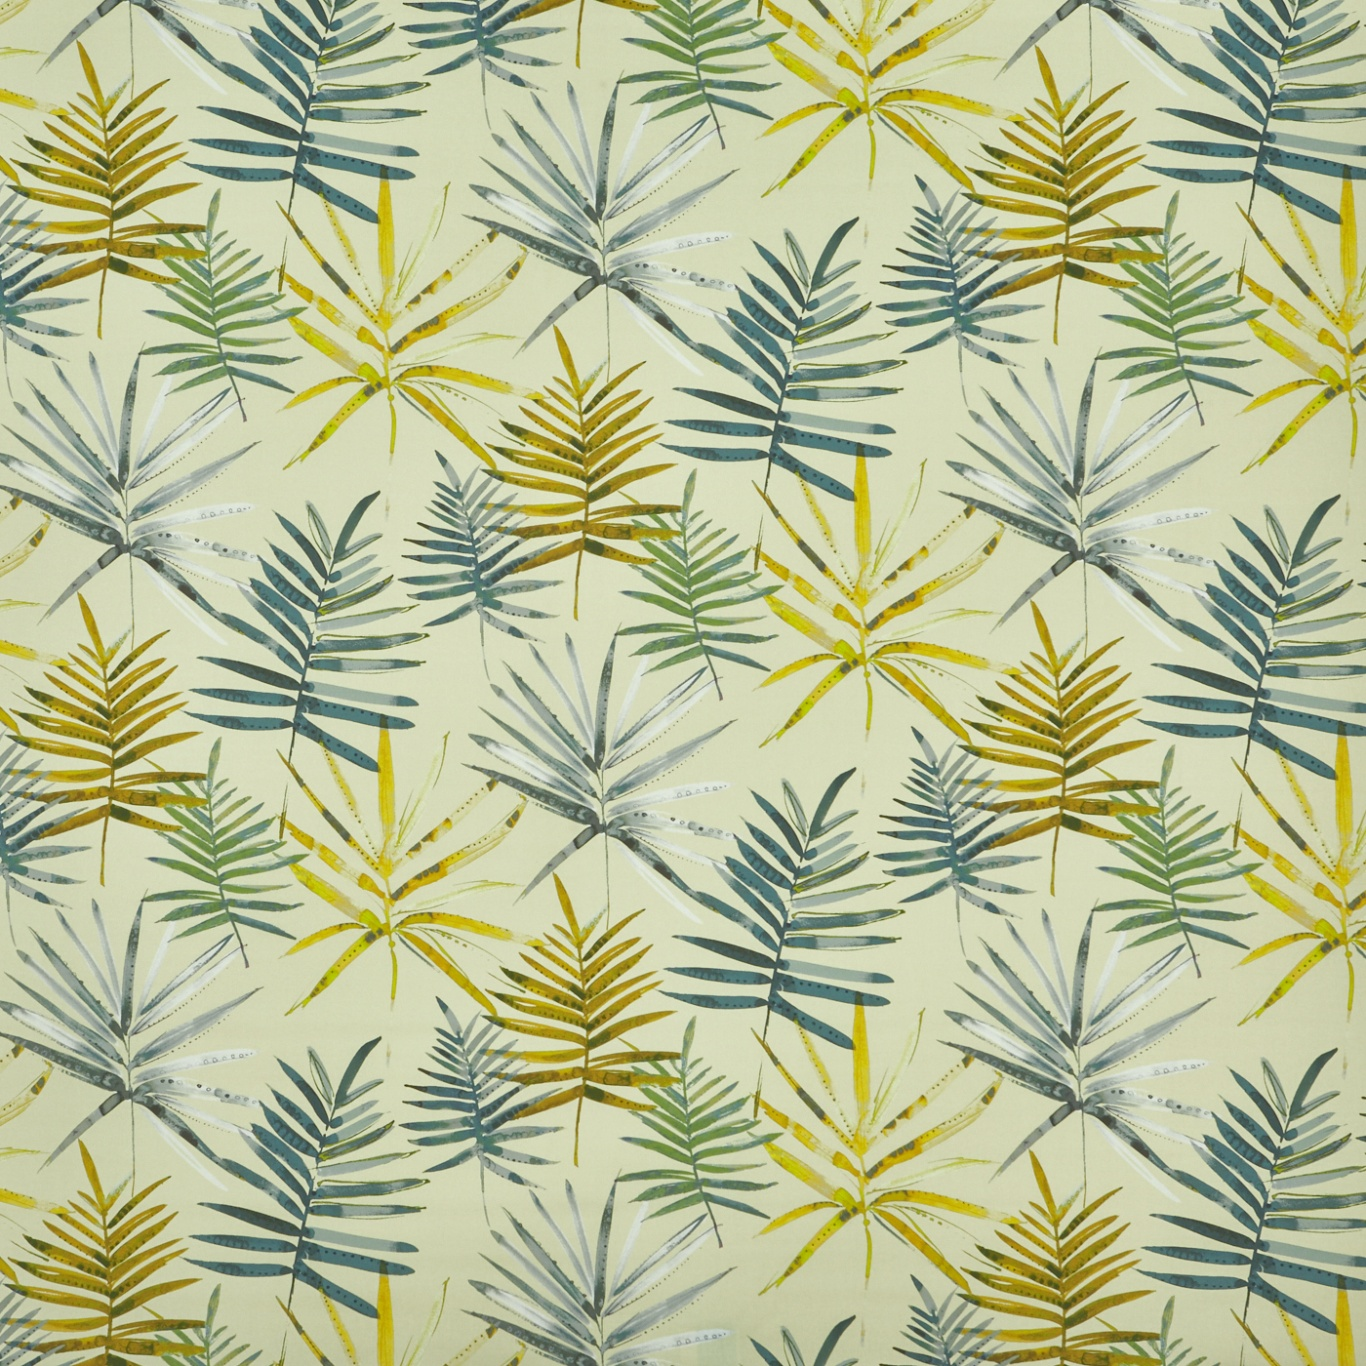 Image of Prestigious Topanga Mimosa Fabric 8665/811